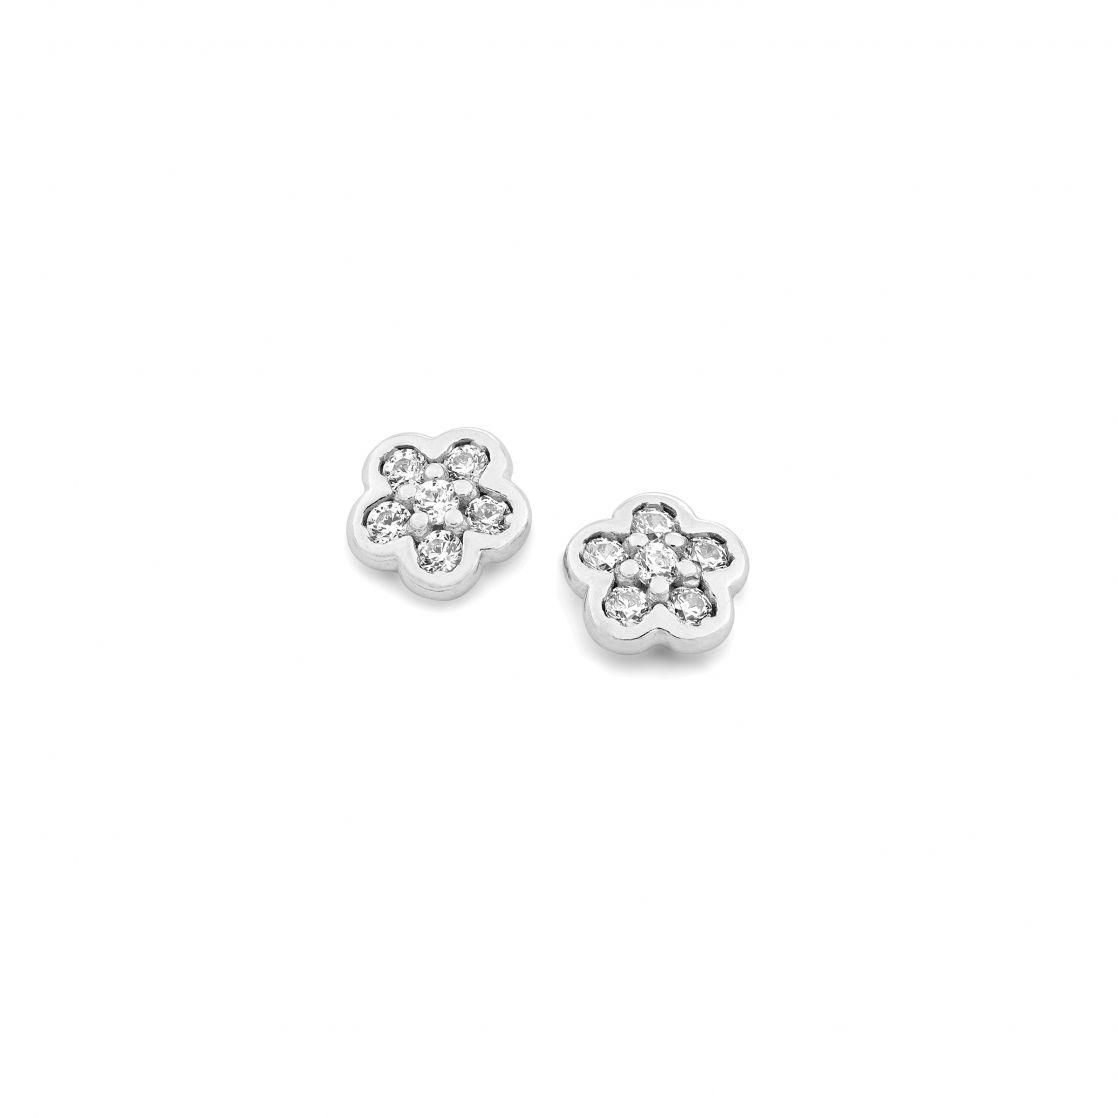 Pave' flower earrings